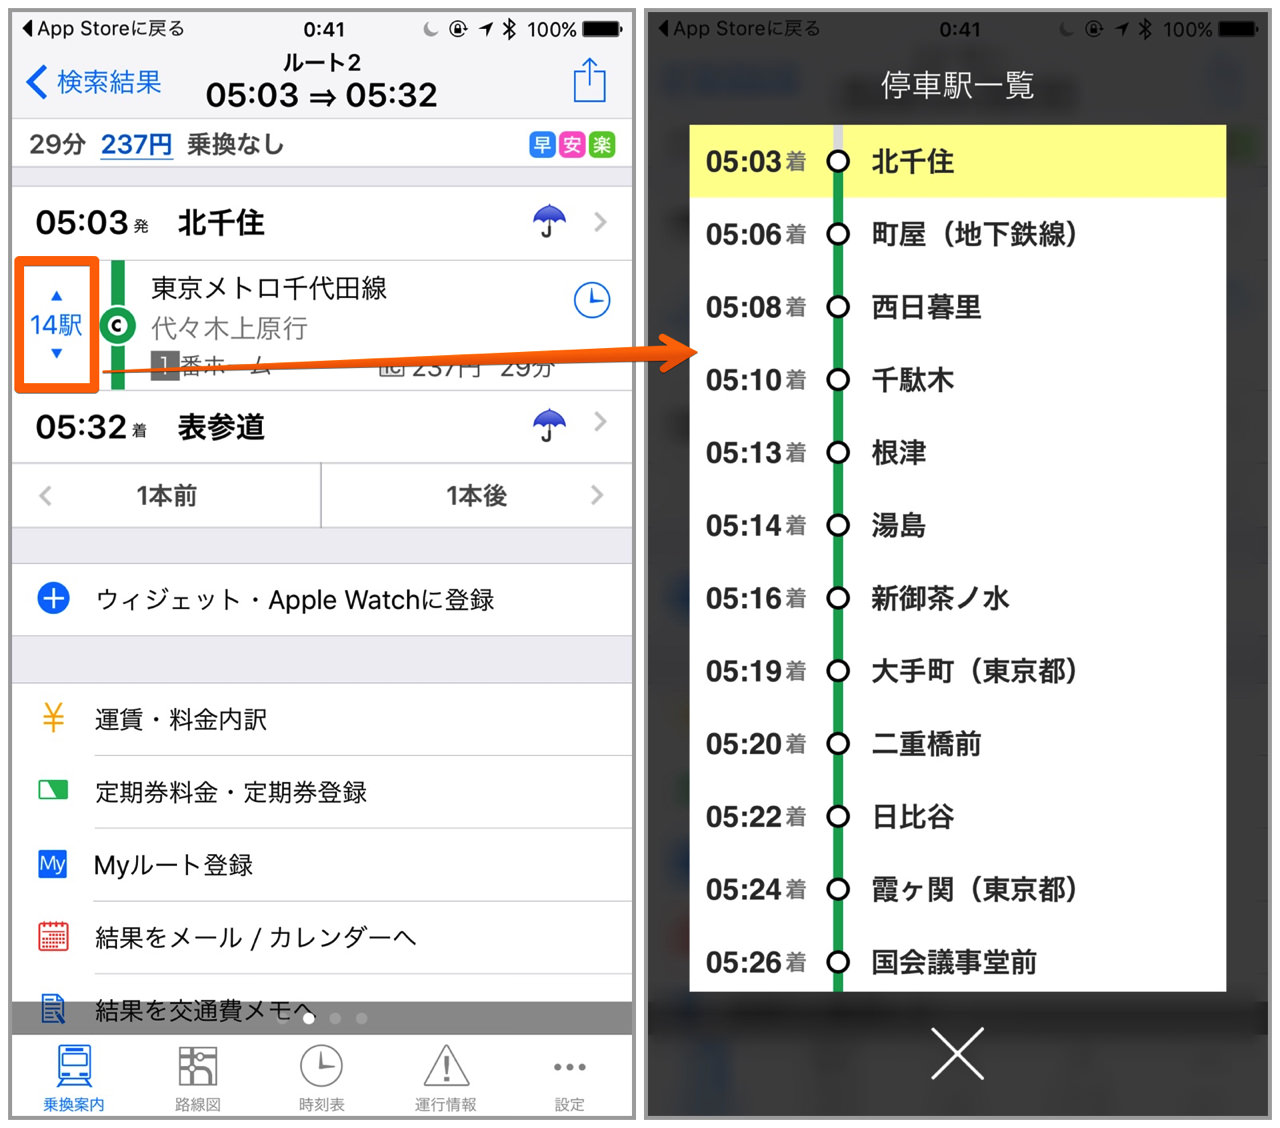 Transfer navitime stop station list2